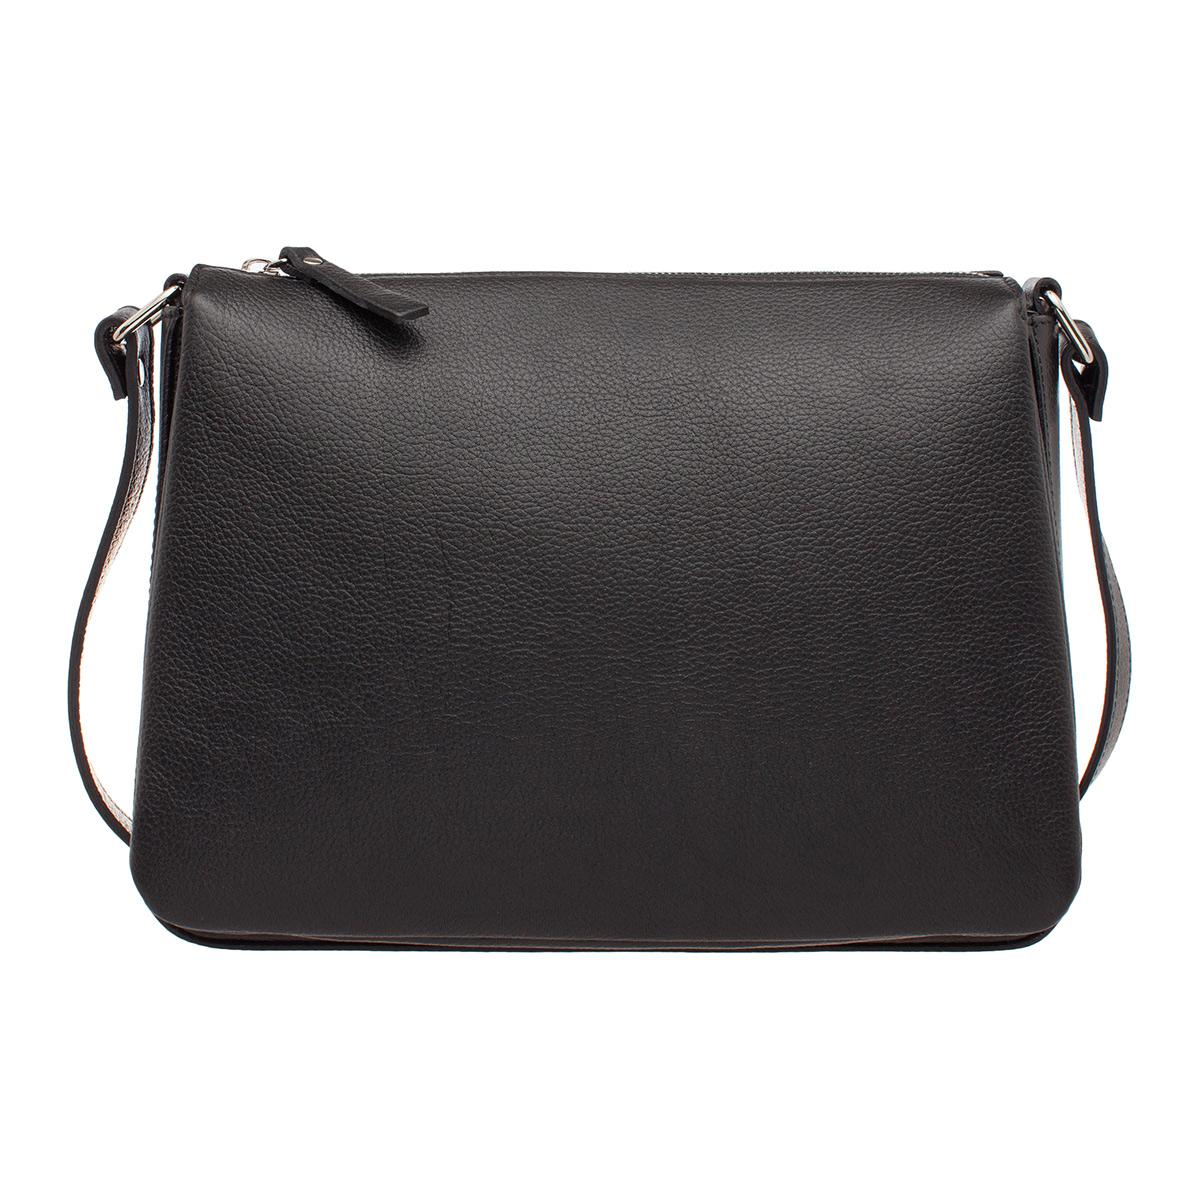 Кожаная сумка через плечо Taylor Black фото